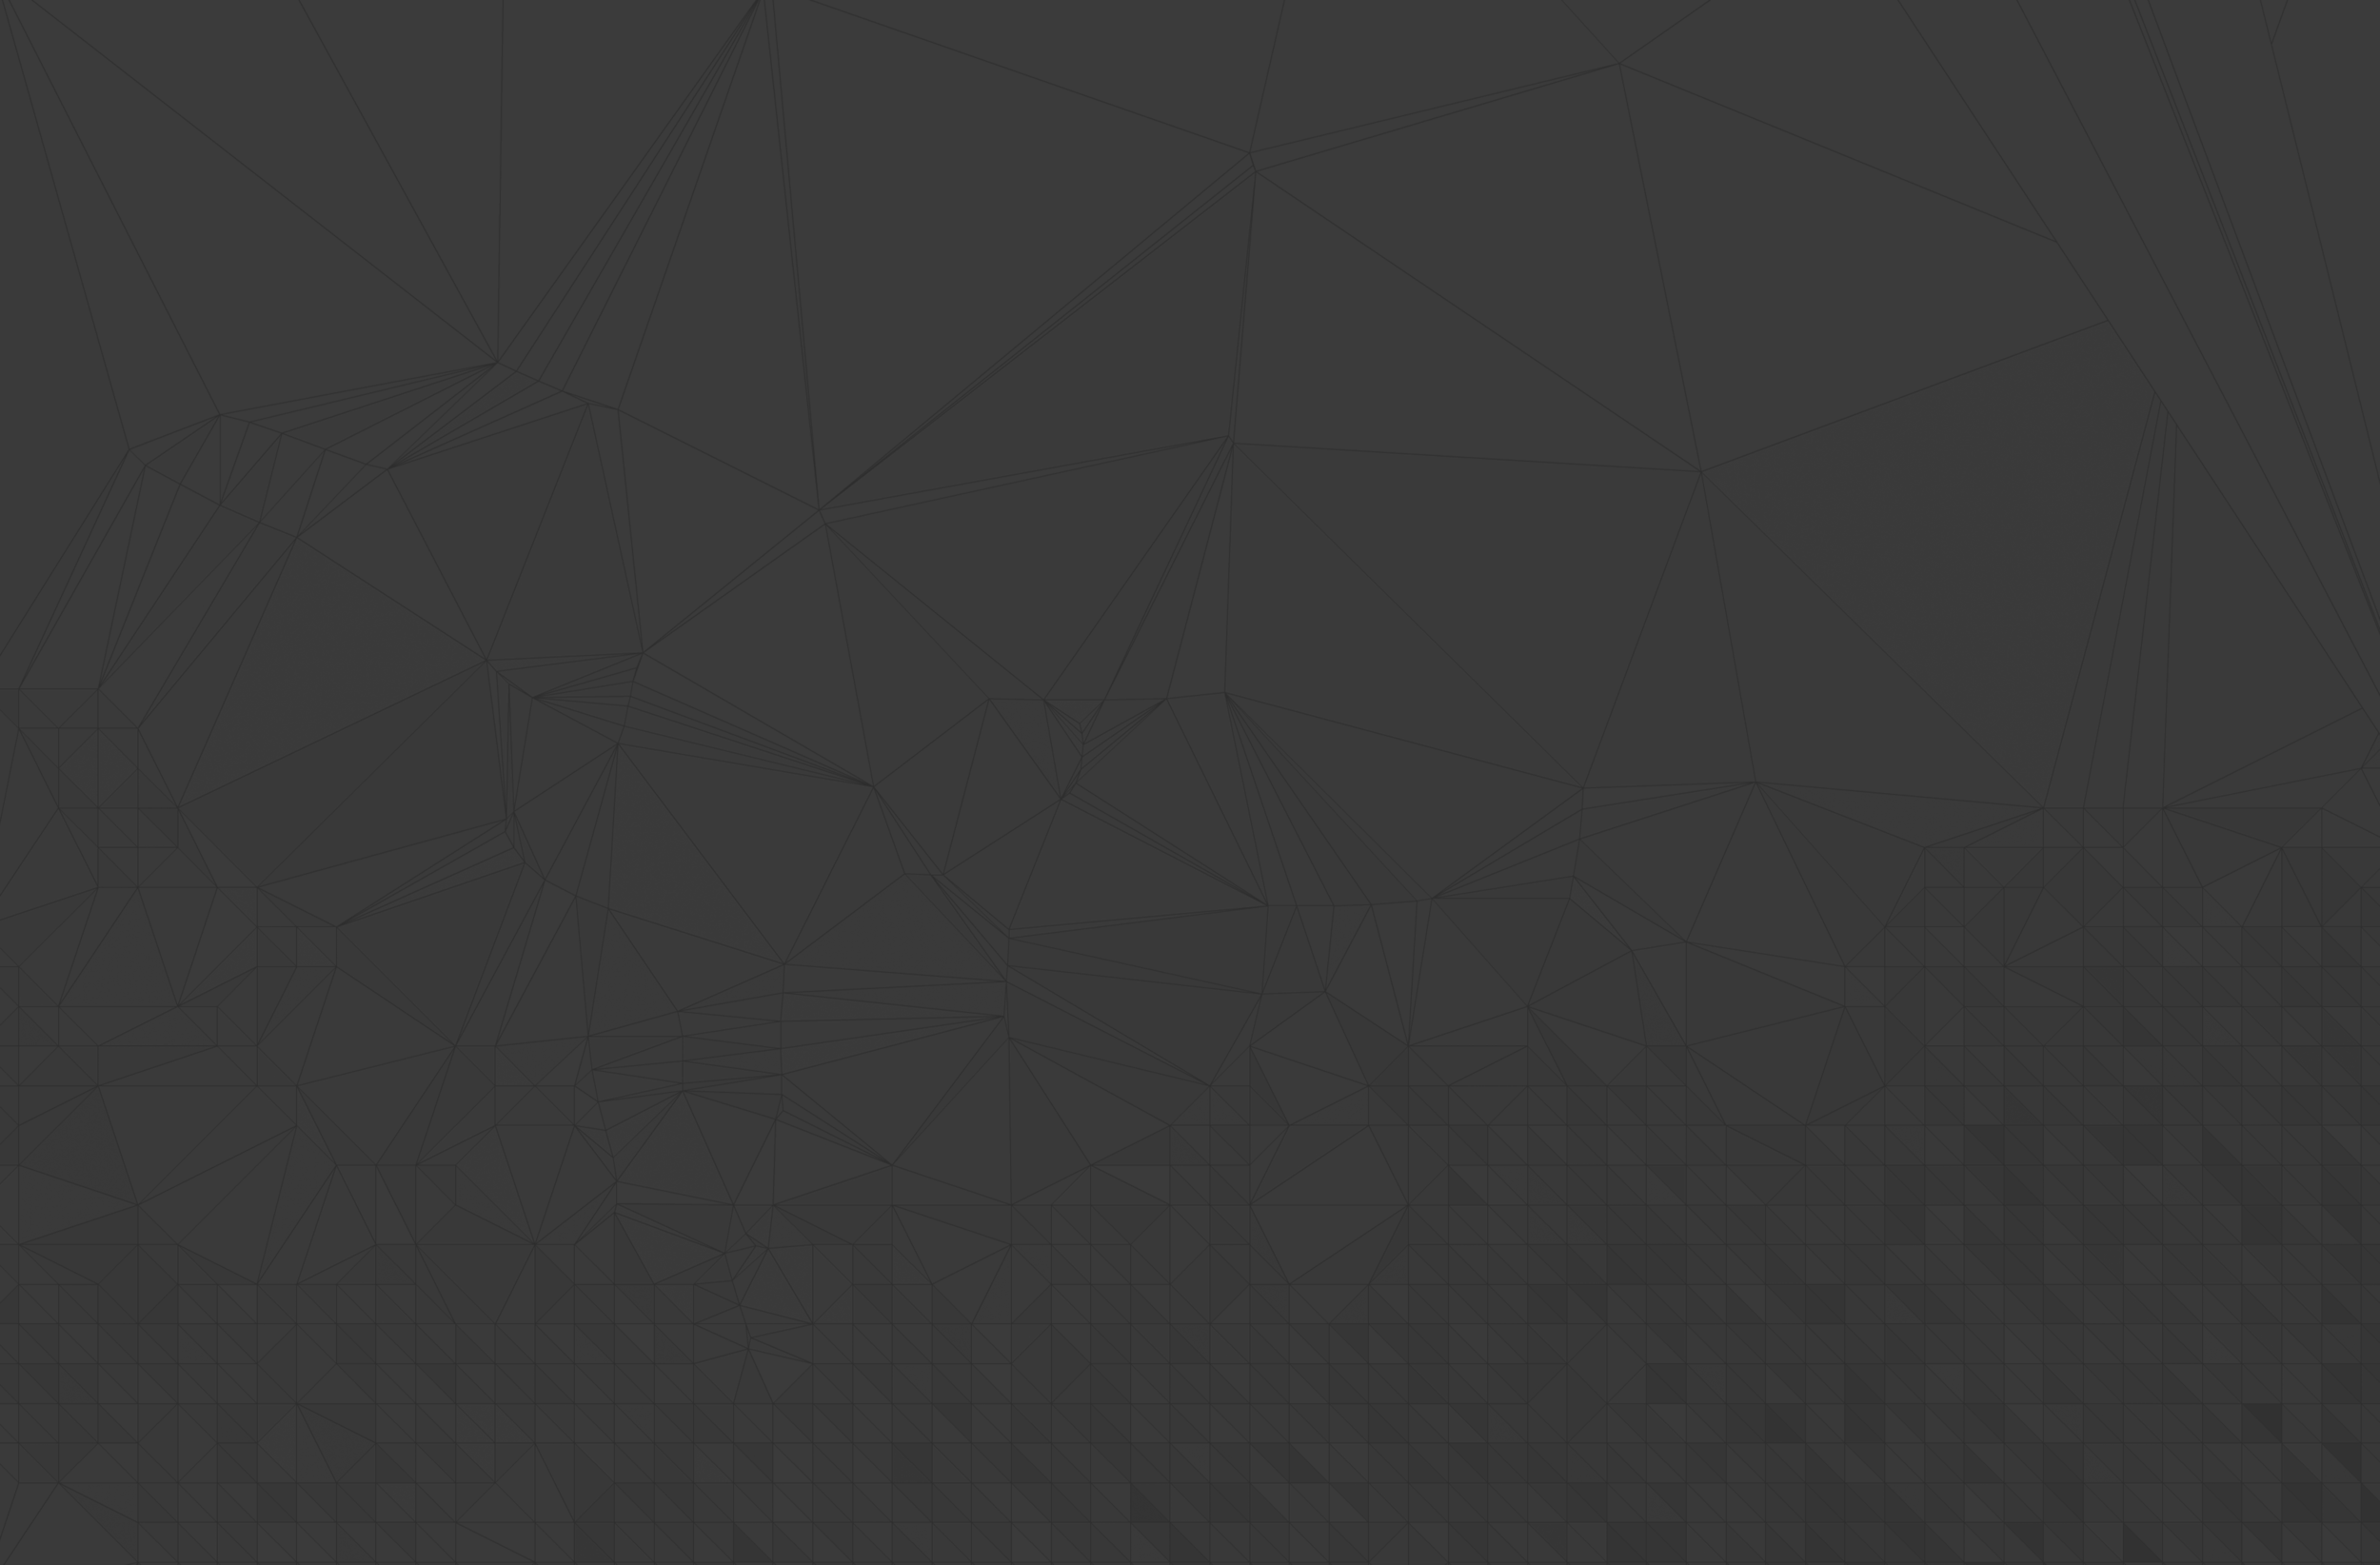 Alchemic_Logo_Treatments_MSTR_background_bw1.png